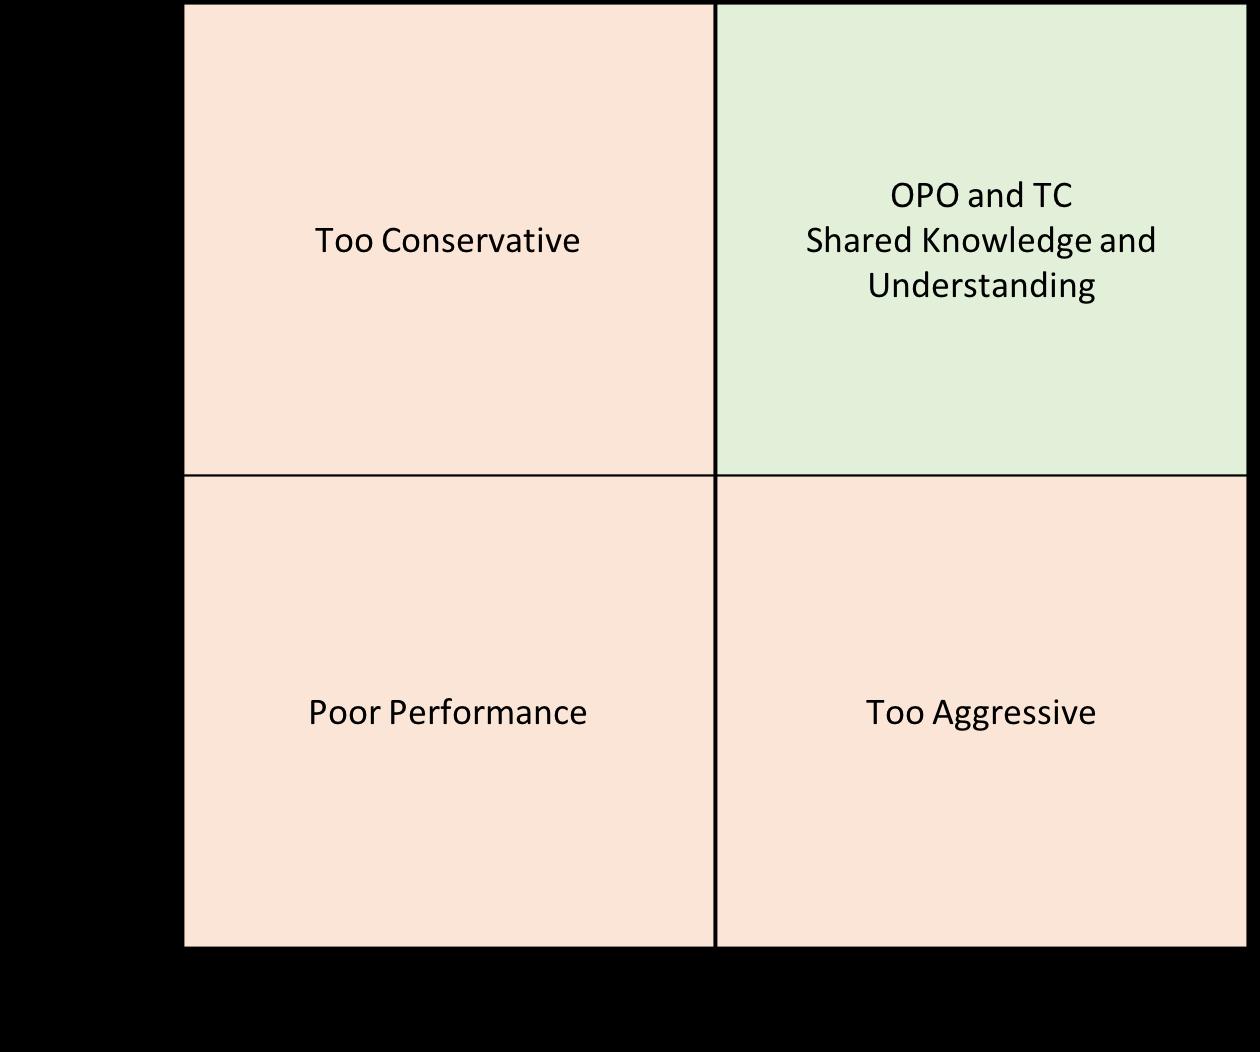 OPOTCincentive1